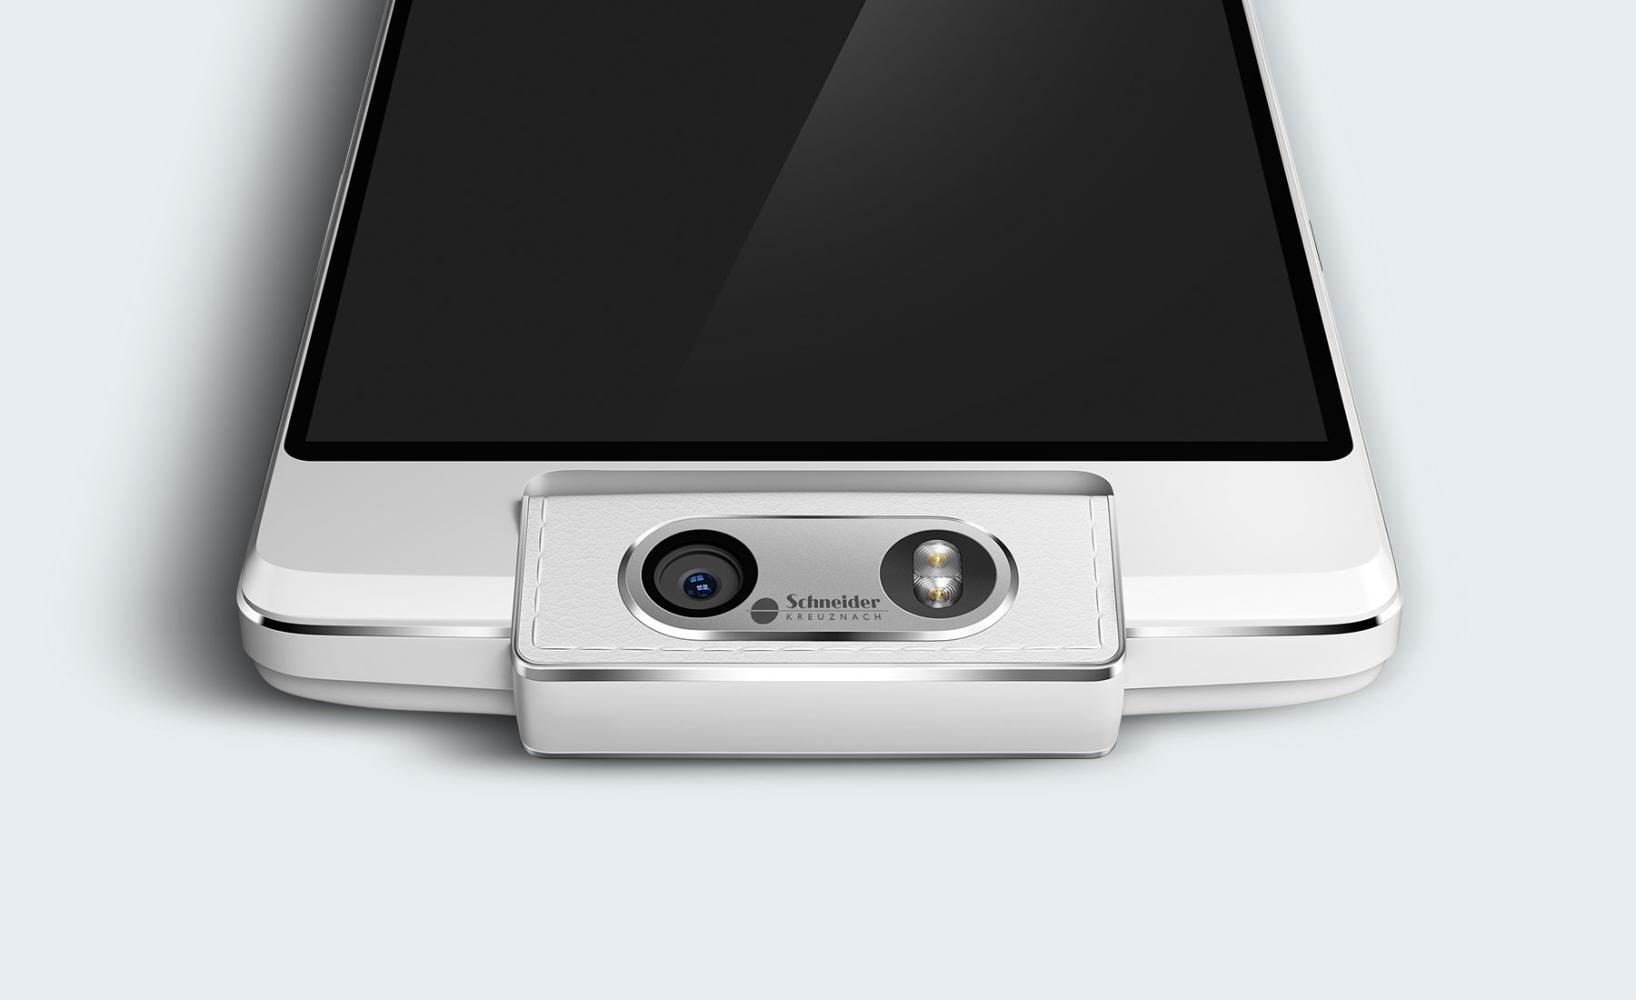 oppo n3非常具有辨识度,在电视上的广告还历历在目,它搭载了德国